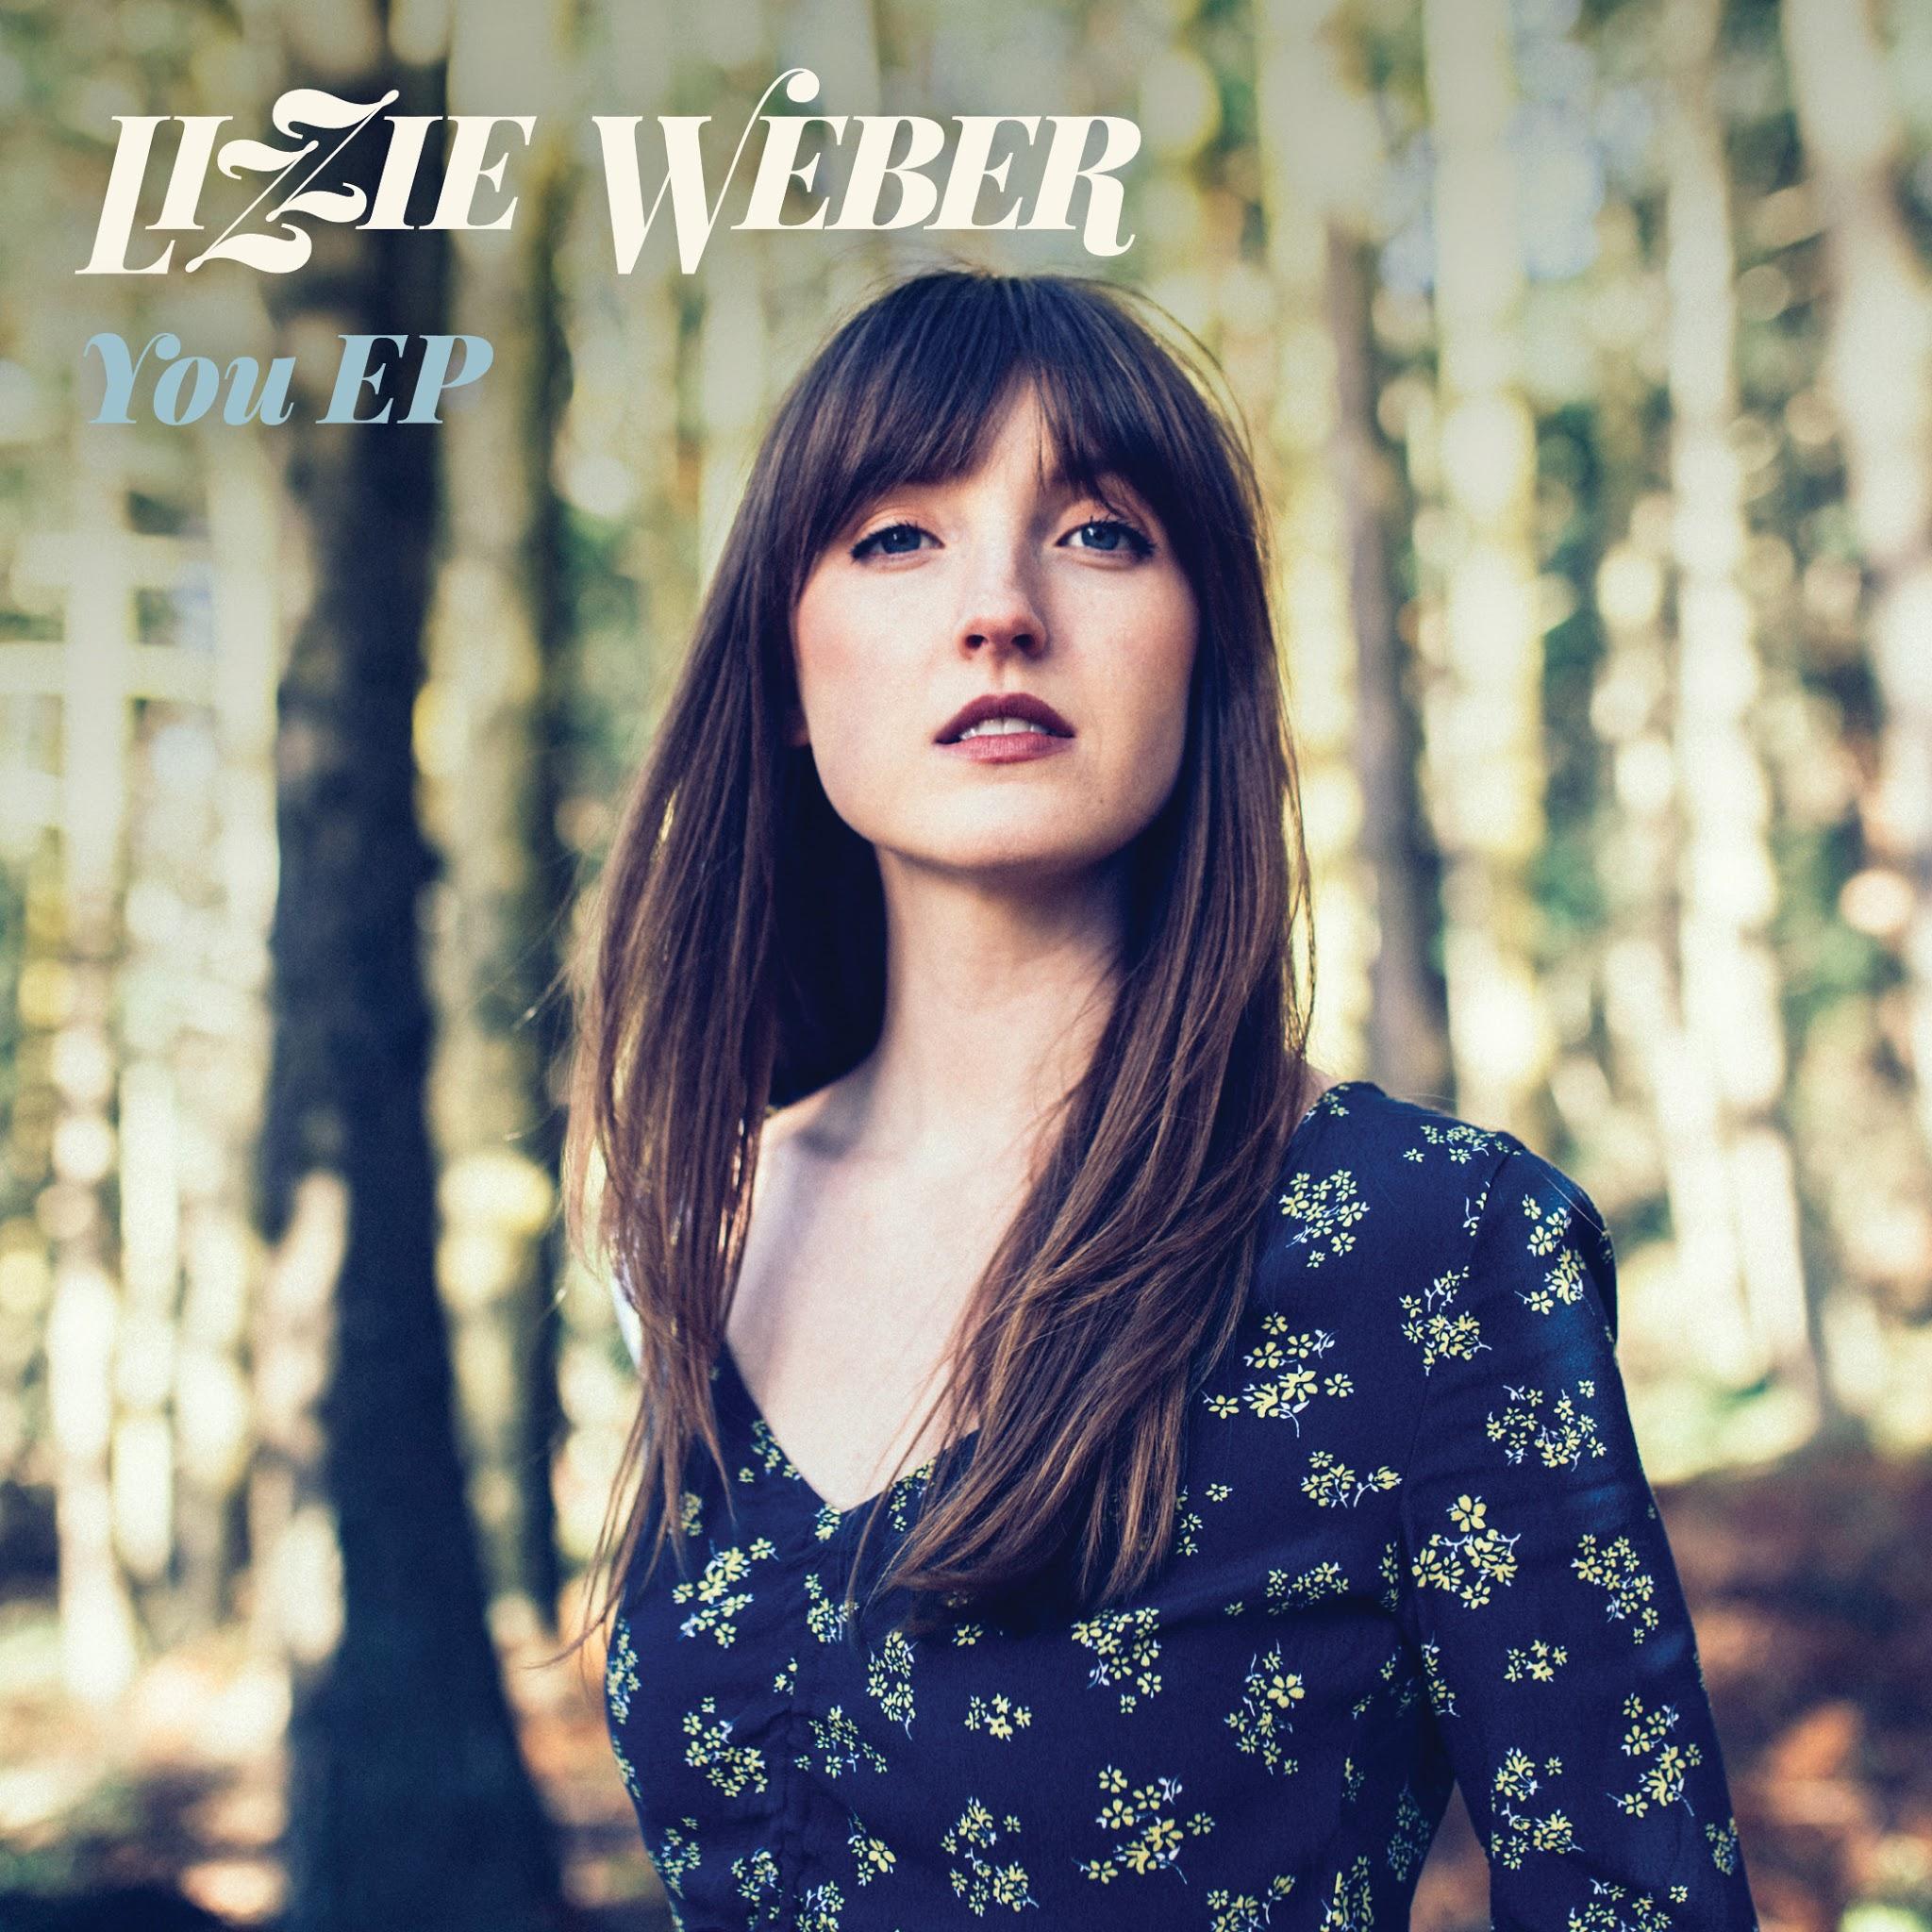 Lizzie_Weber-YouEP.jpeg